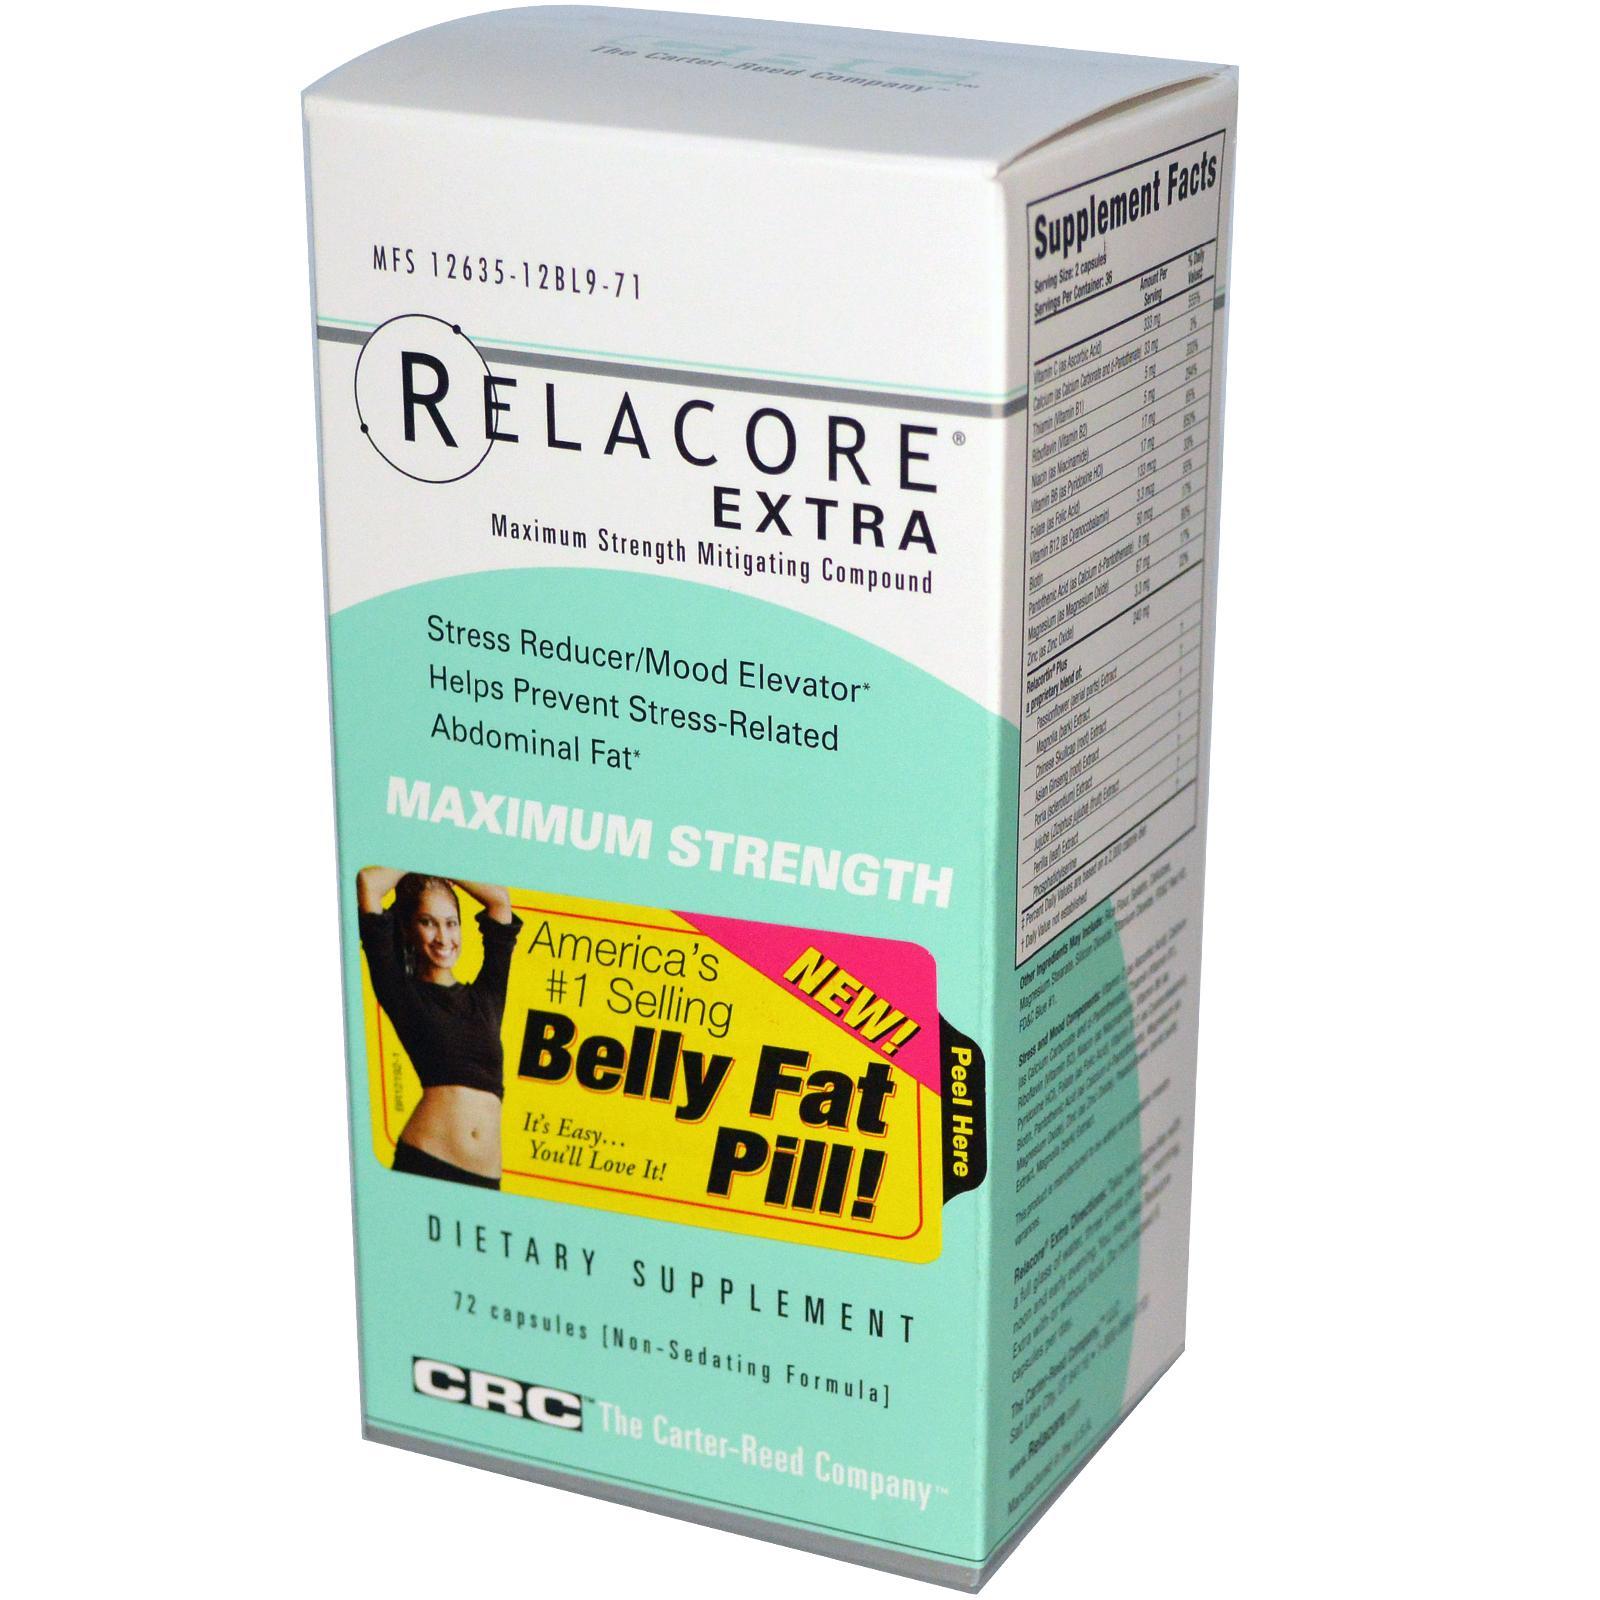 Image of Relacore Extra x 6 Bottles